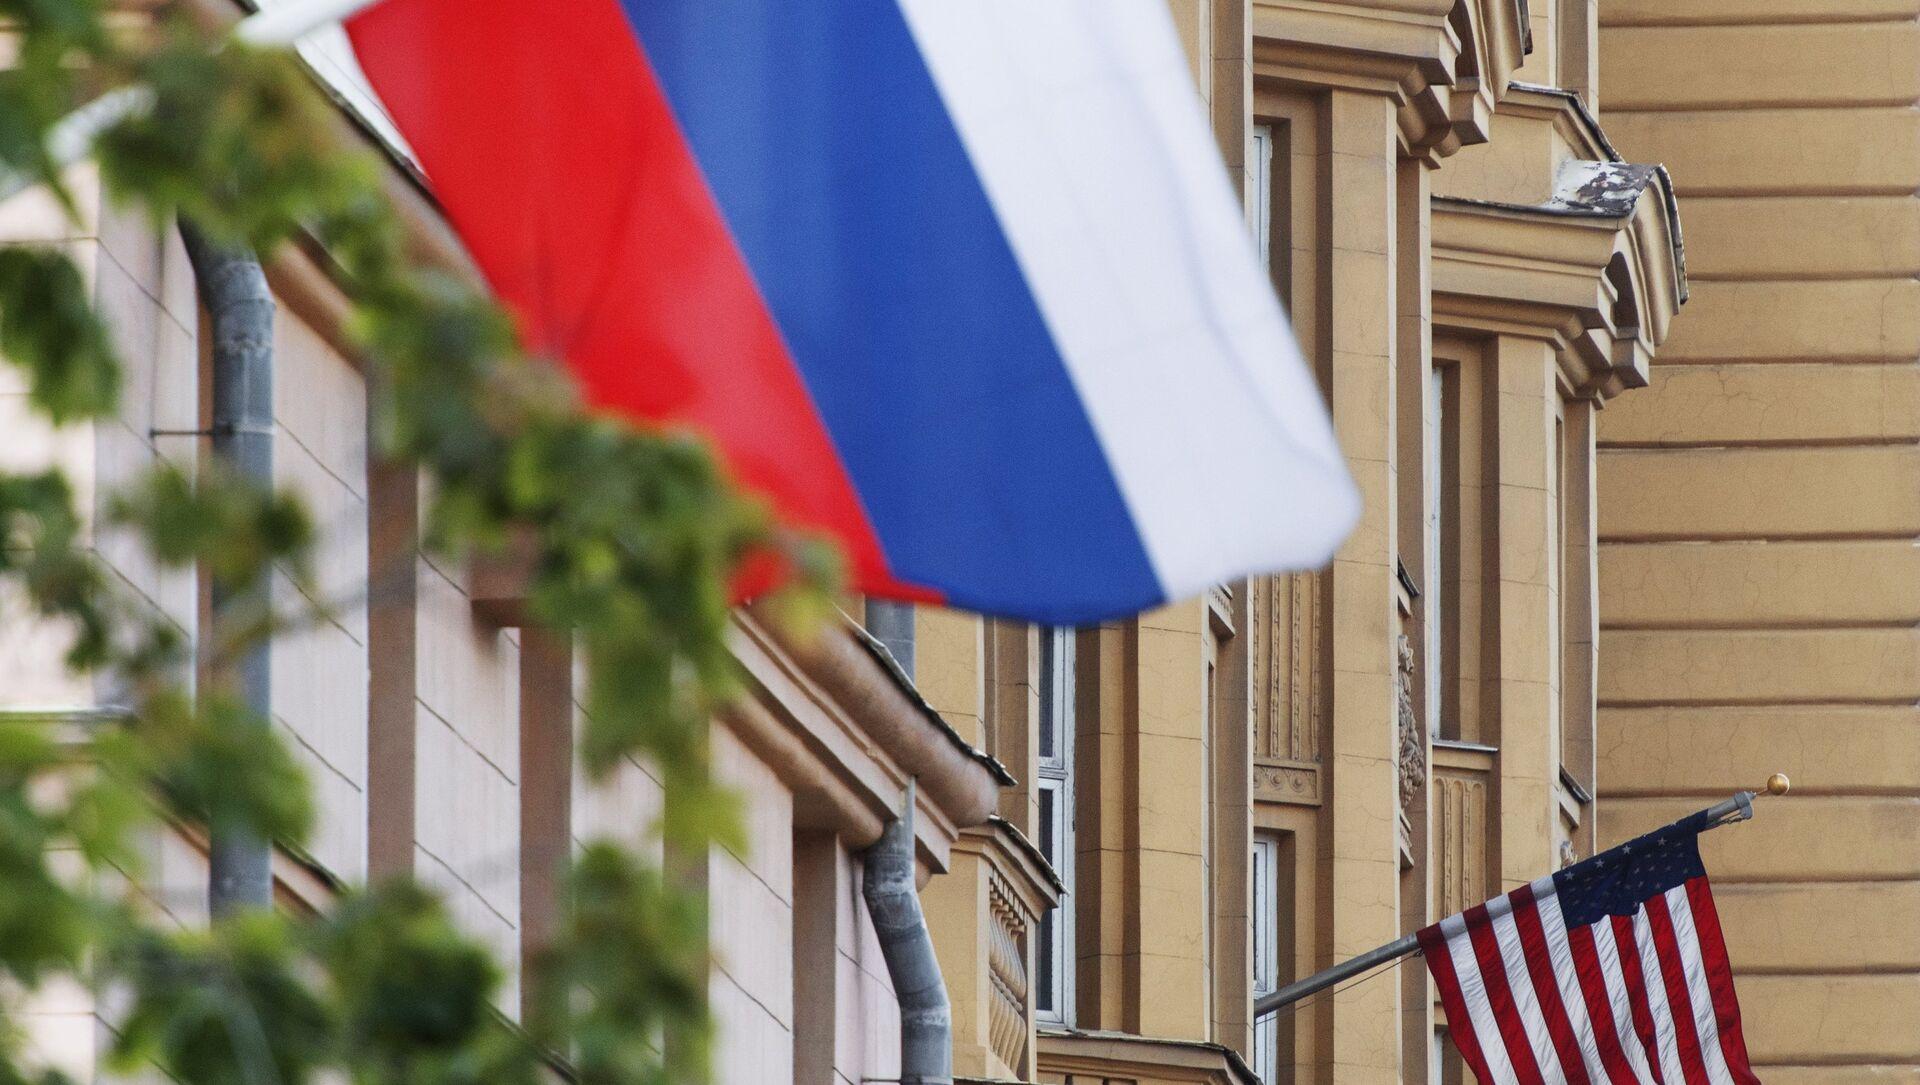 Le bandiere Russia USA - Sputnik Italia, 1920, 01.02.2021